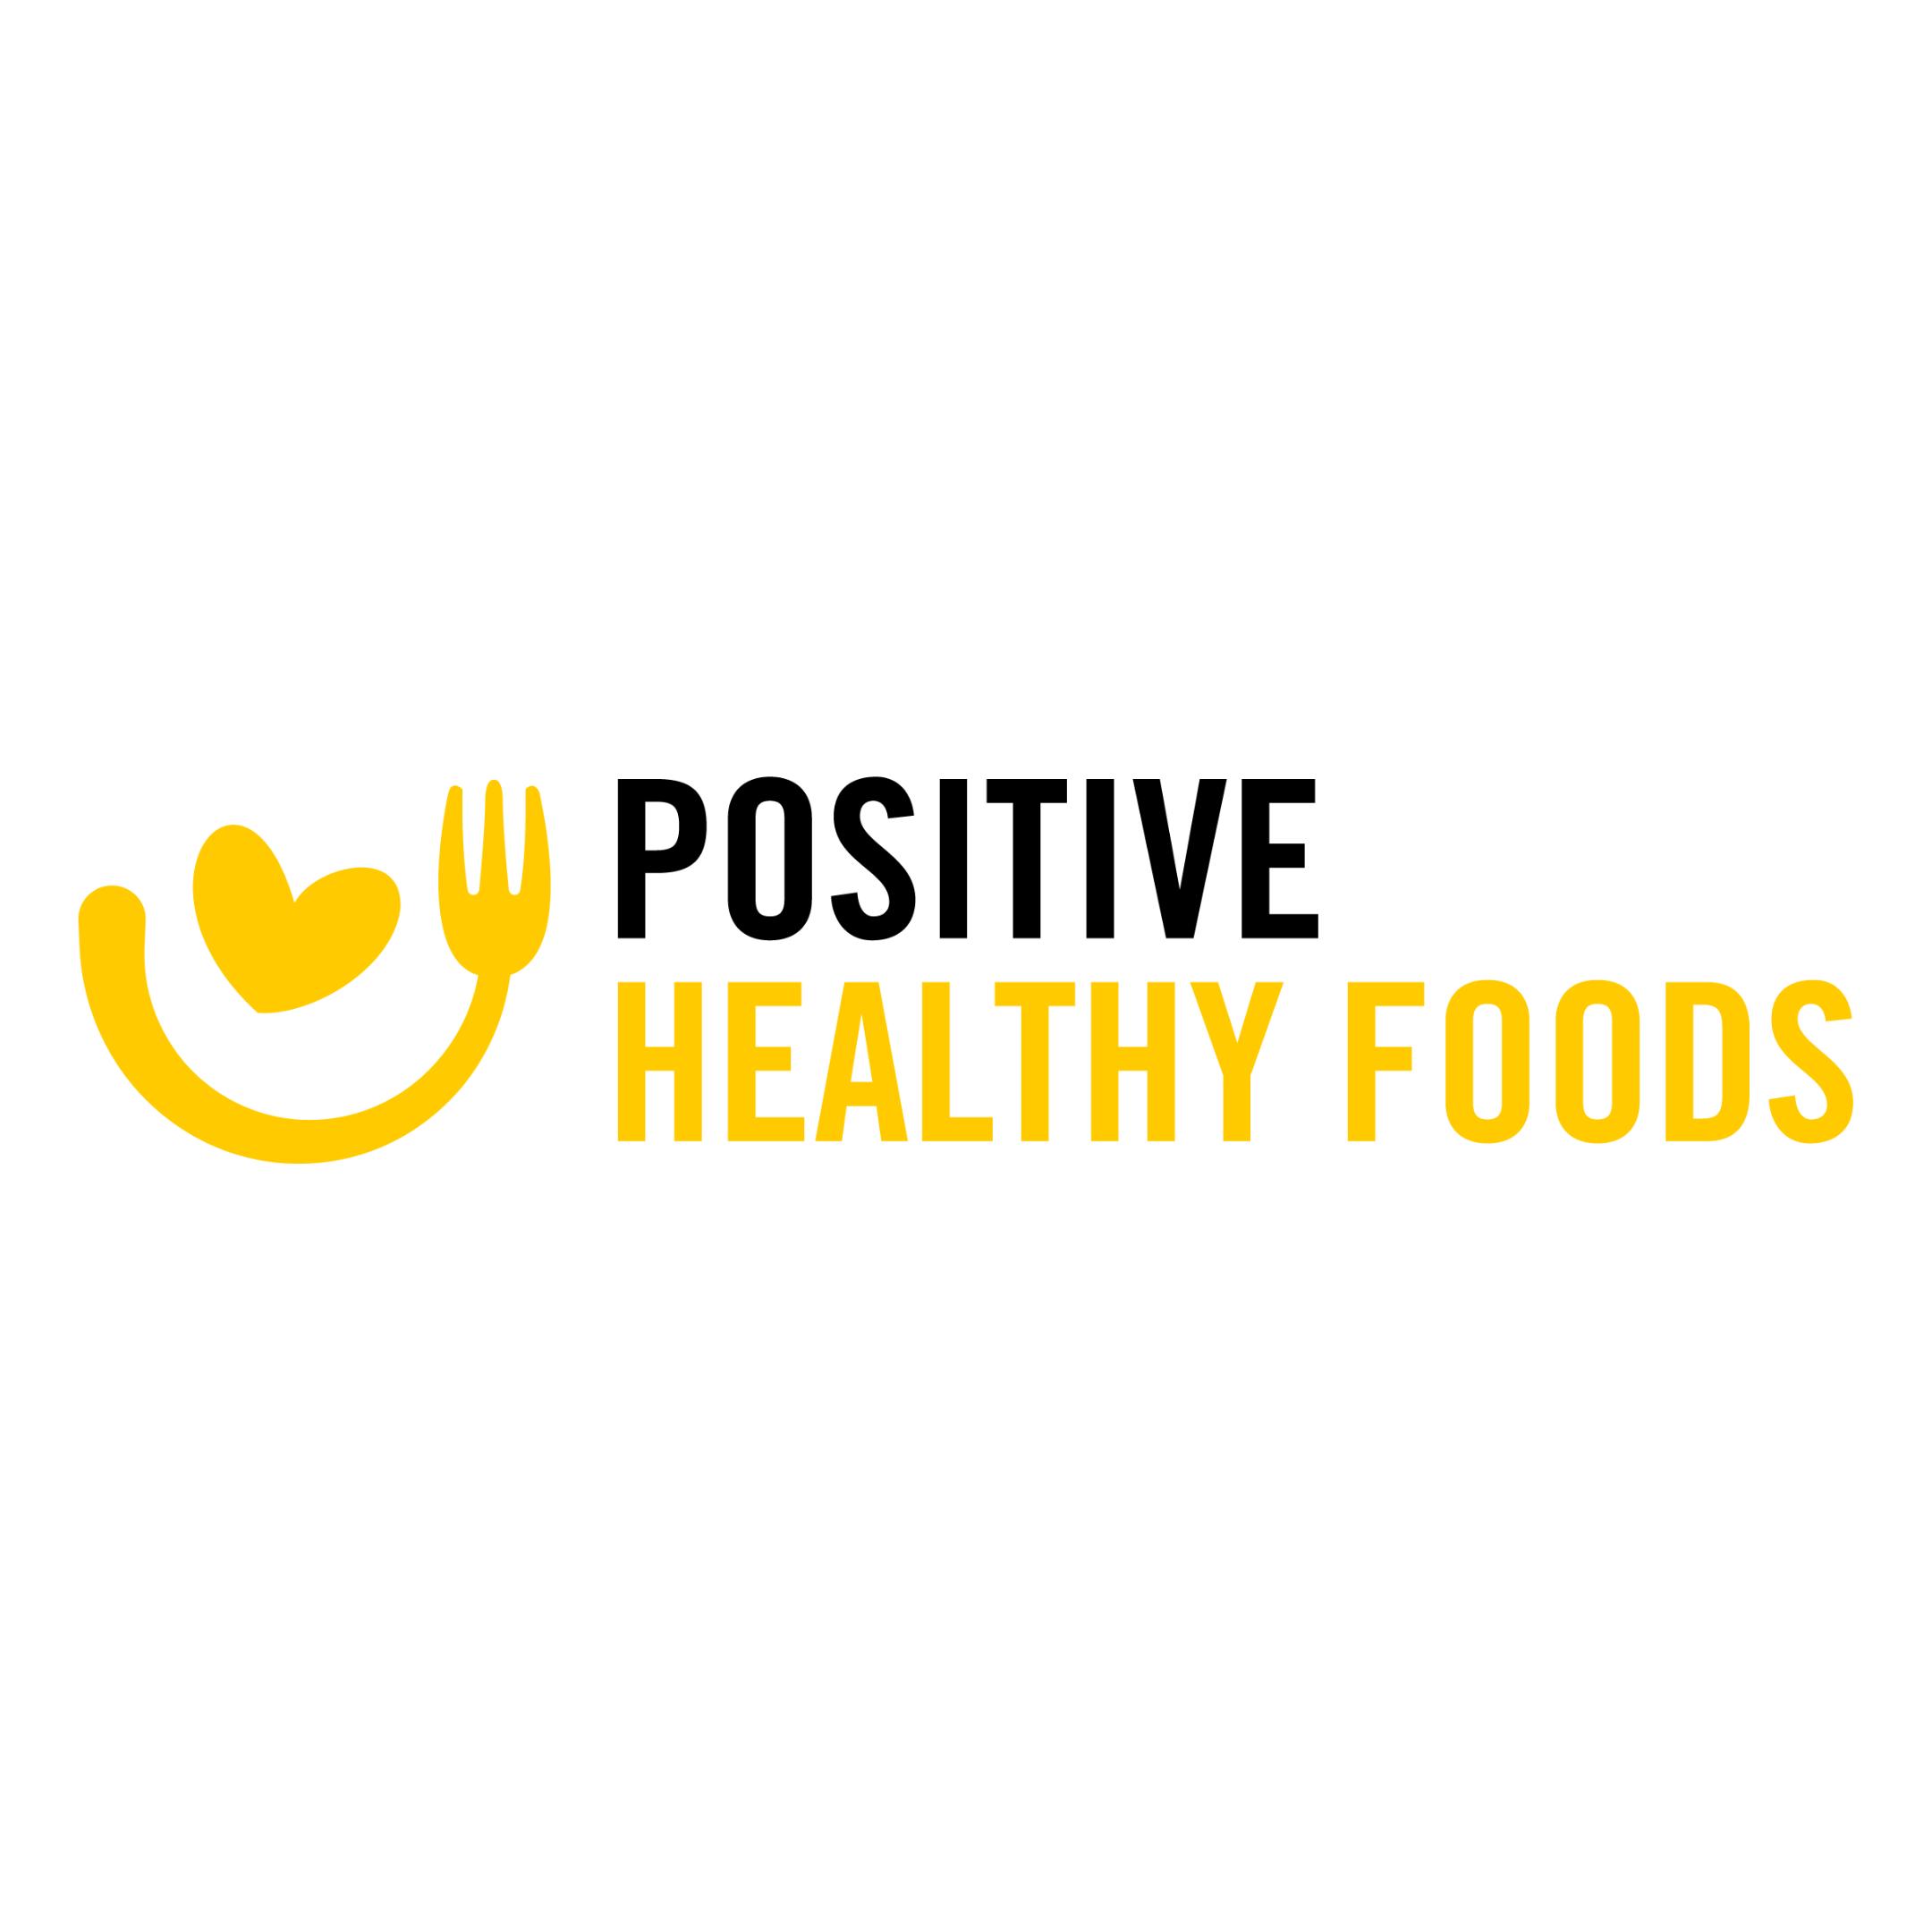 Positive Healthy Foods